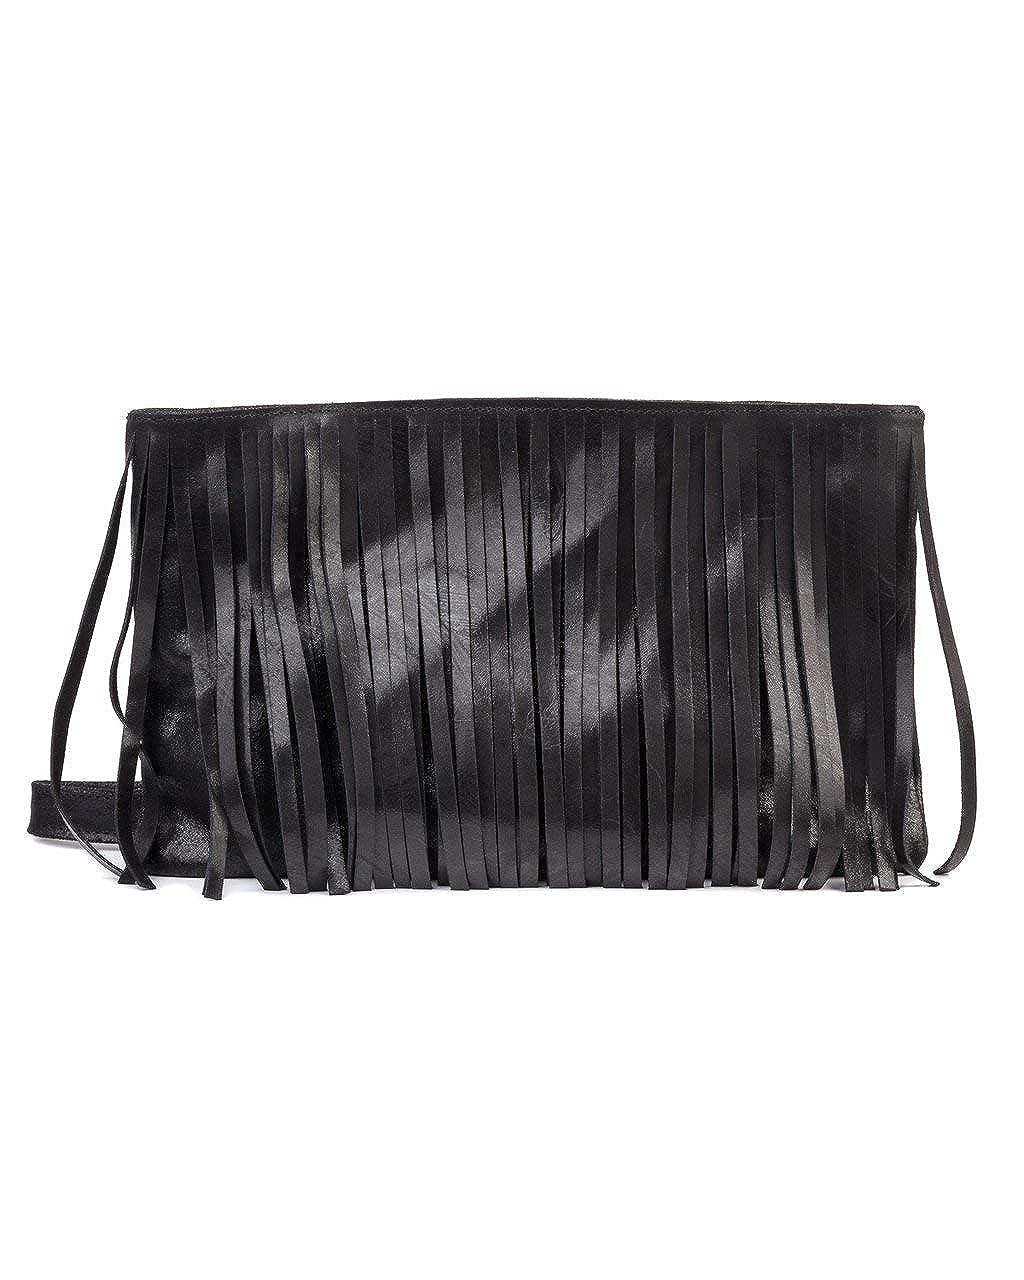 7c0dc0c25b0f CoFi Handmade Genuine Leather Azzie Fringe Bag - Over 15 Unique Patterns